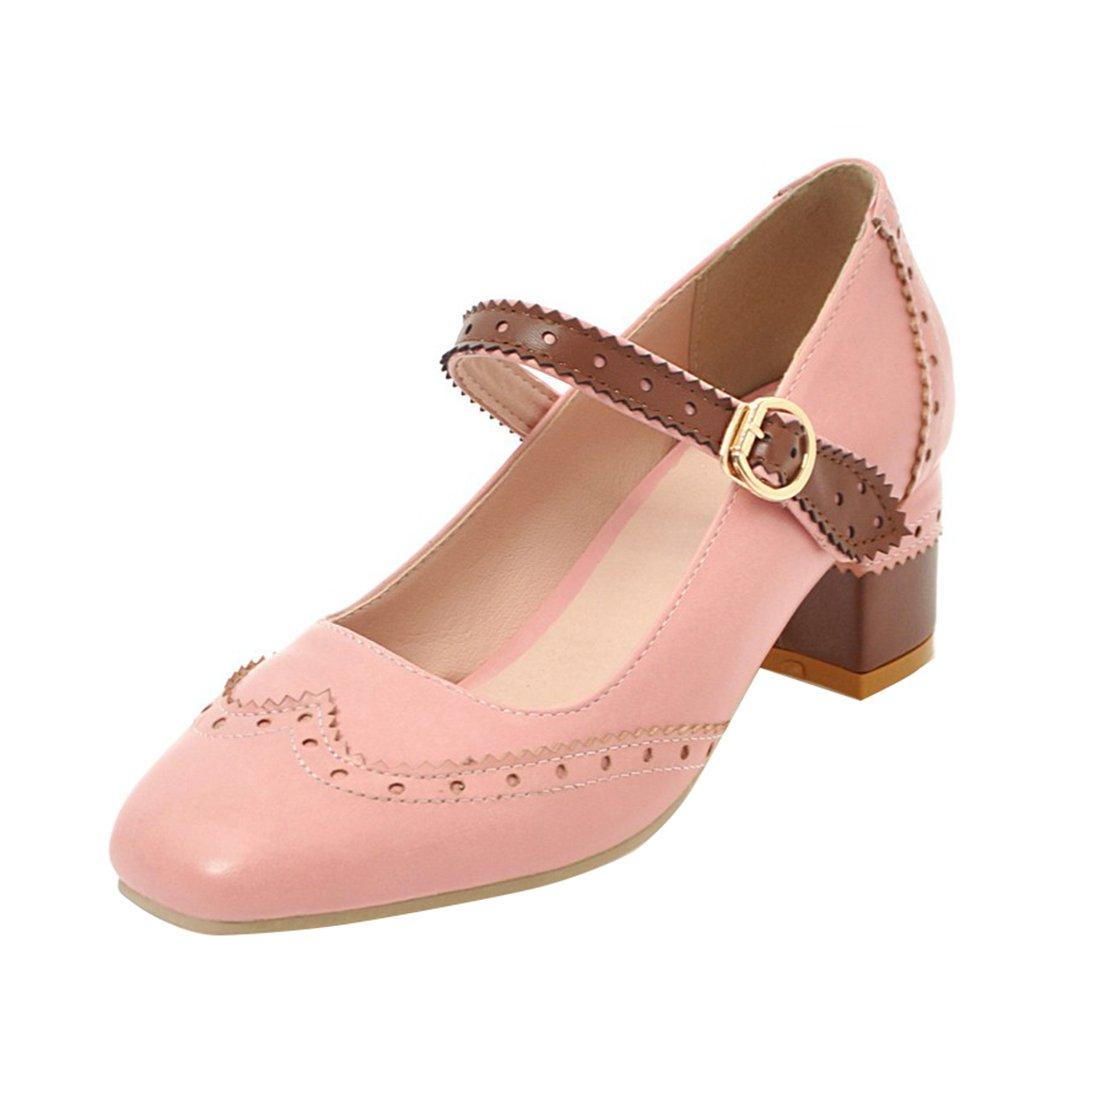 YE Damen Mary Janes Brogue Pumps Blockabsatz High Heels mit Riemchen Elegant Schuhe  41 EU|Rosa